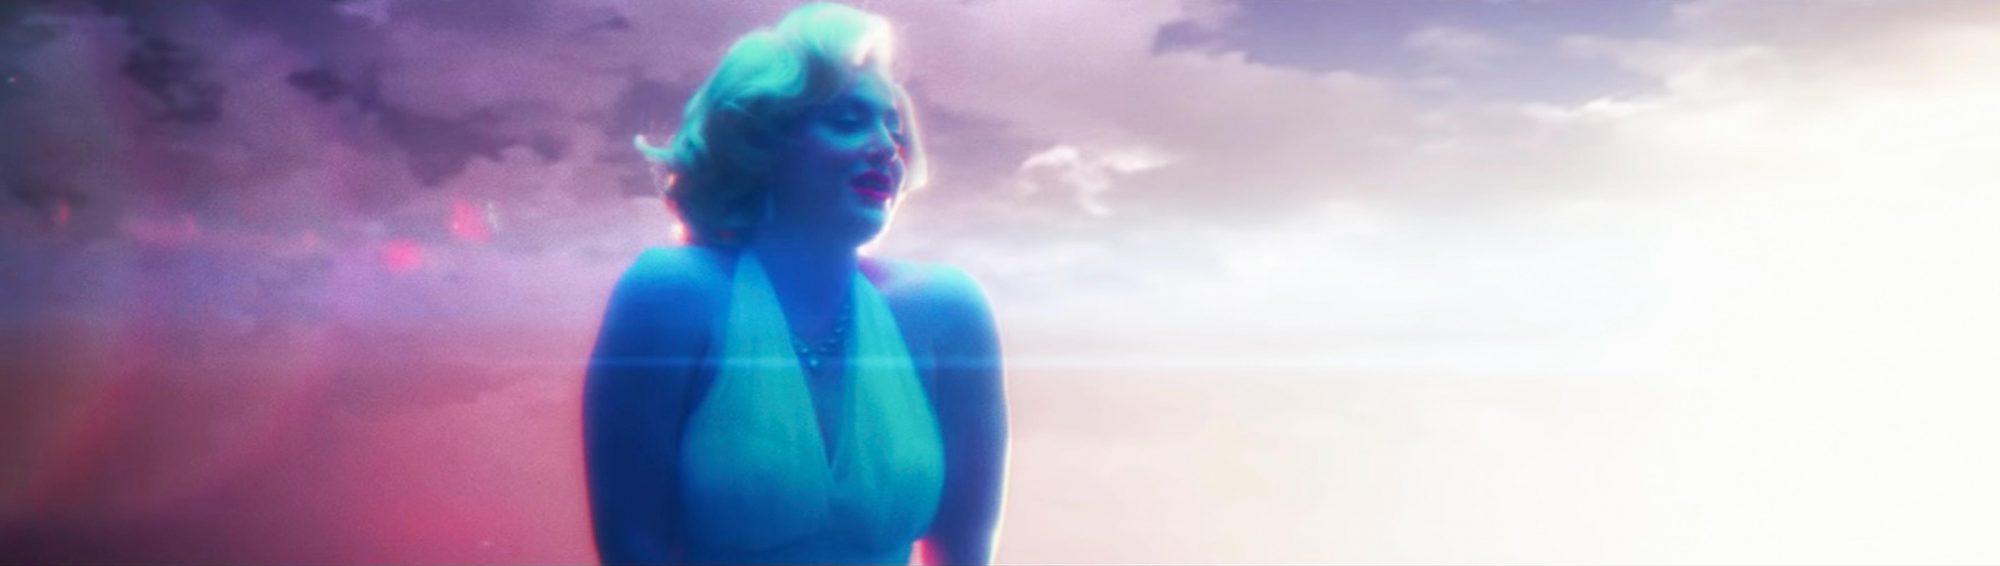 Lana Del Rey music videosscreengrab